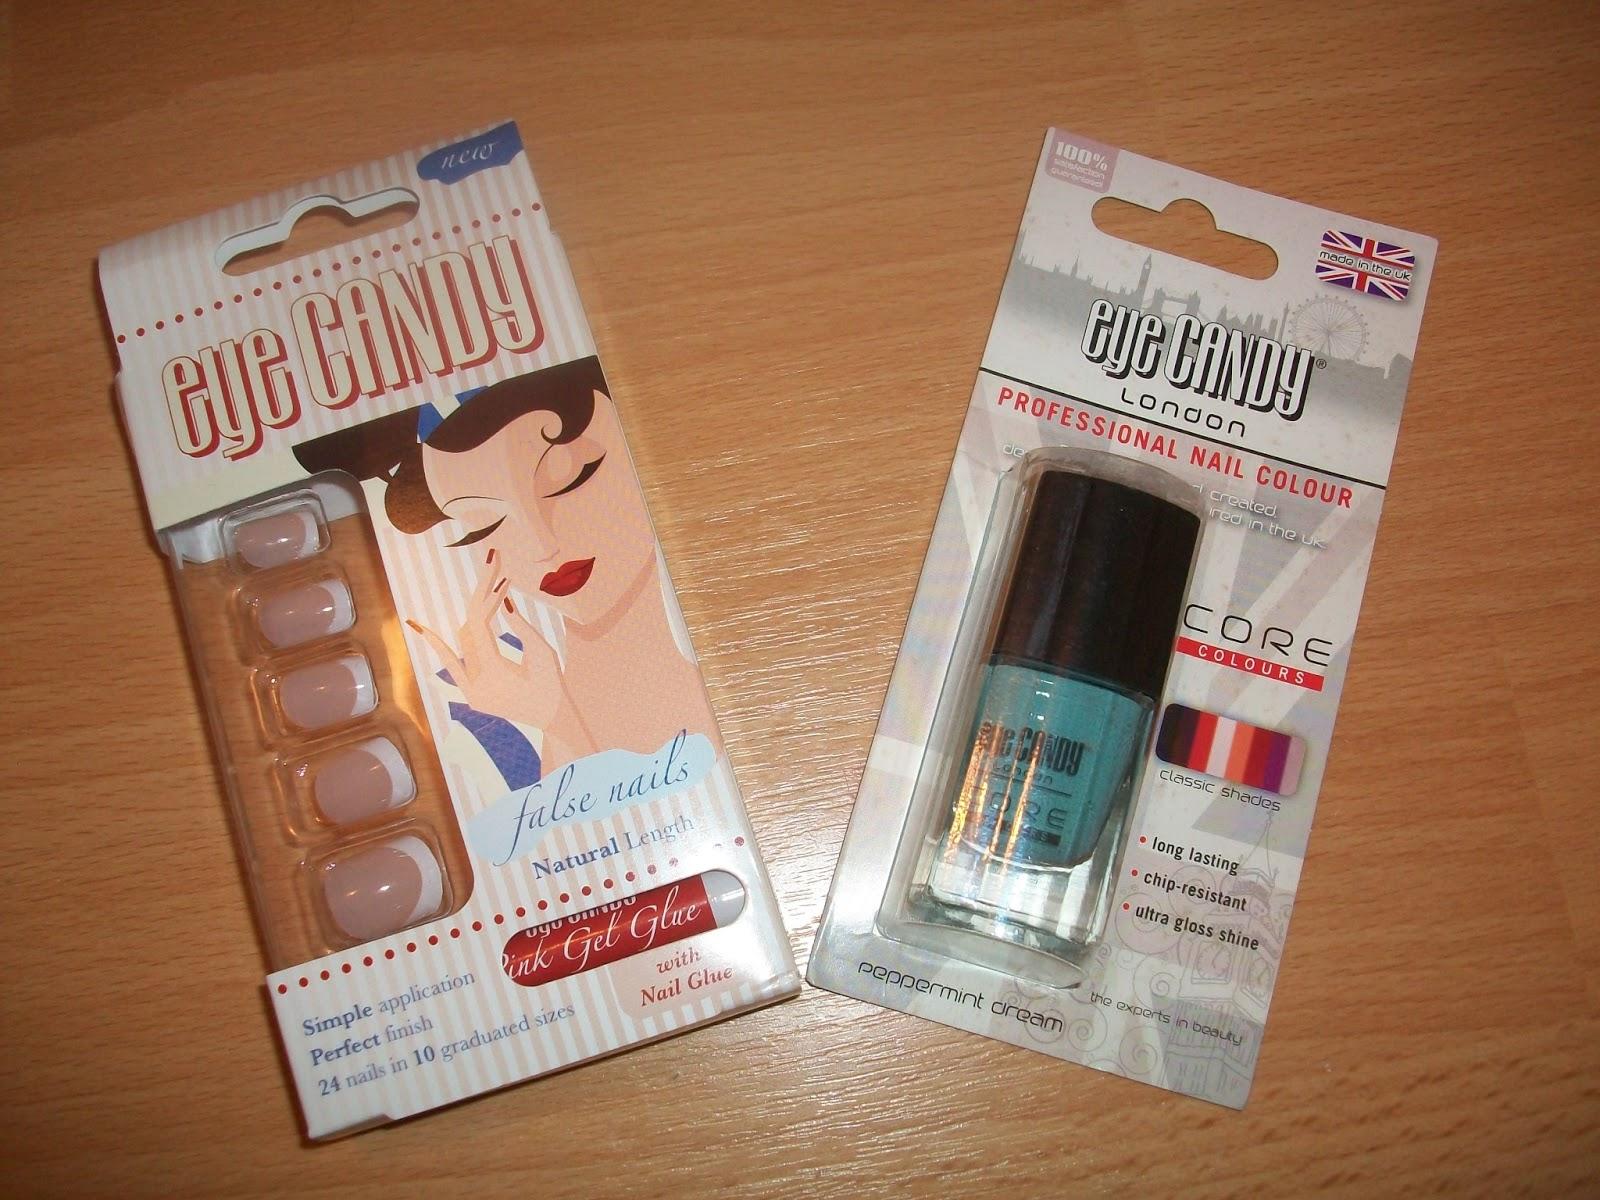 Beauty Wednesdays: Eye Candy False Nails from www.Ohbeauty.co.uk ...